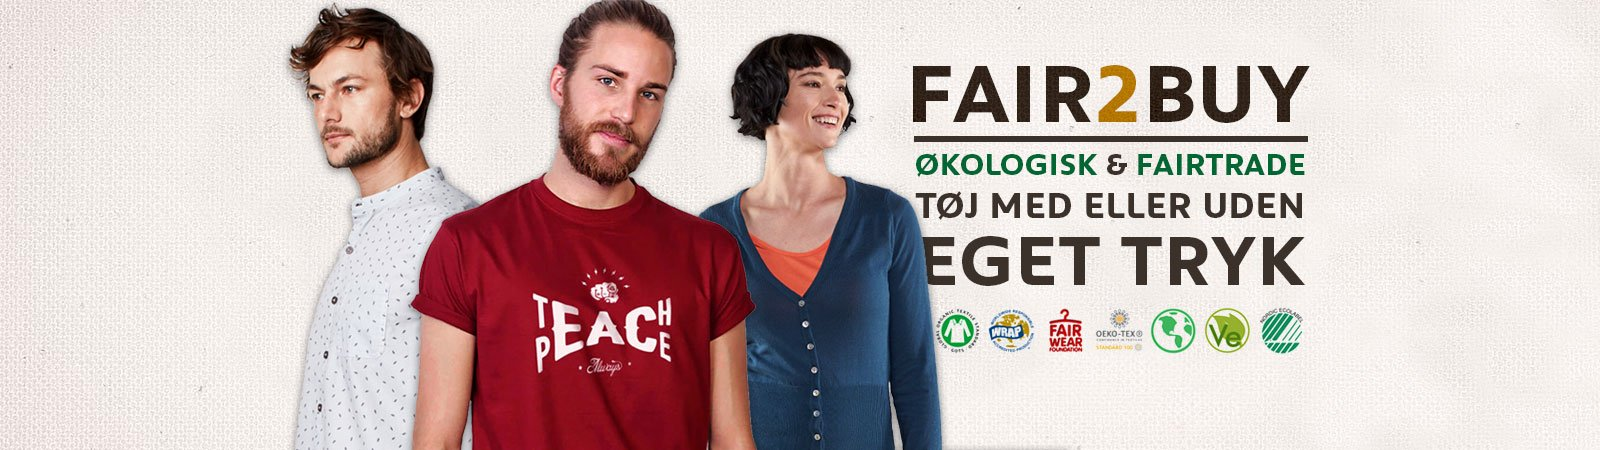 29330d18a18 Velkommen til Fair2Buy – Økologisk & Fairtrade tøj og produkter med tryk